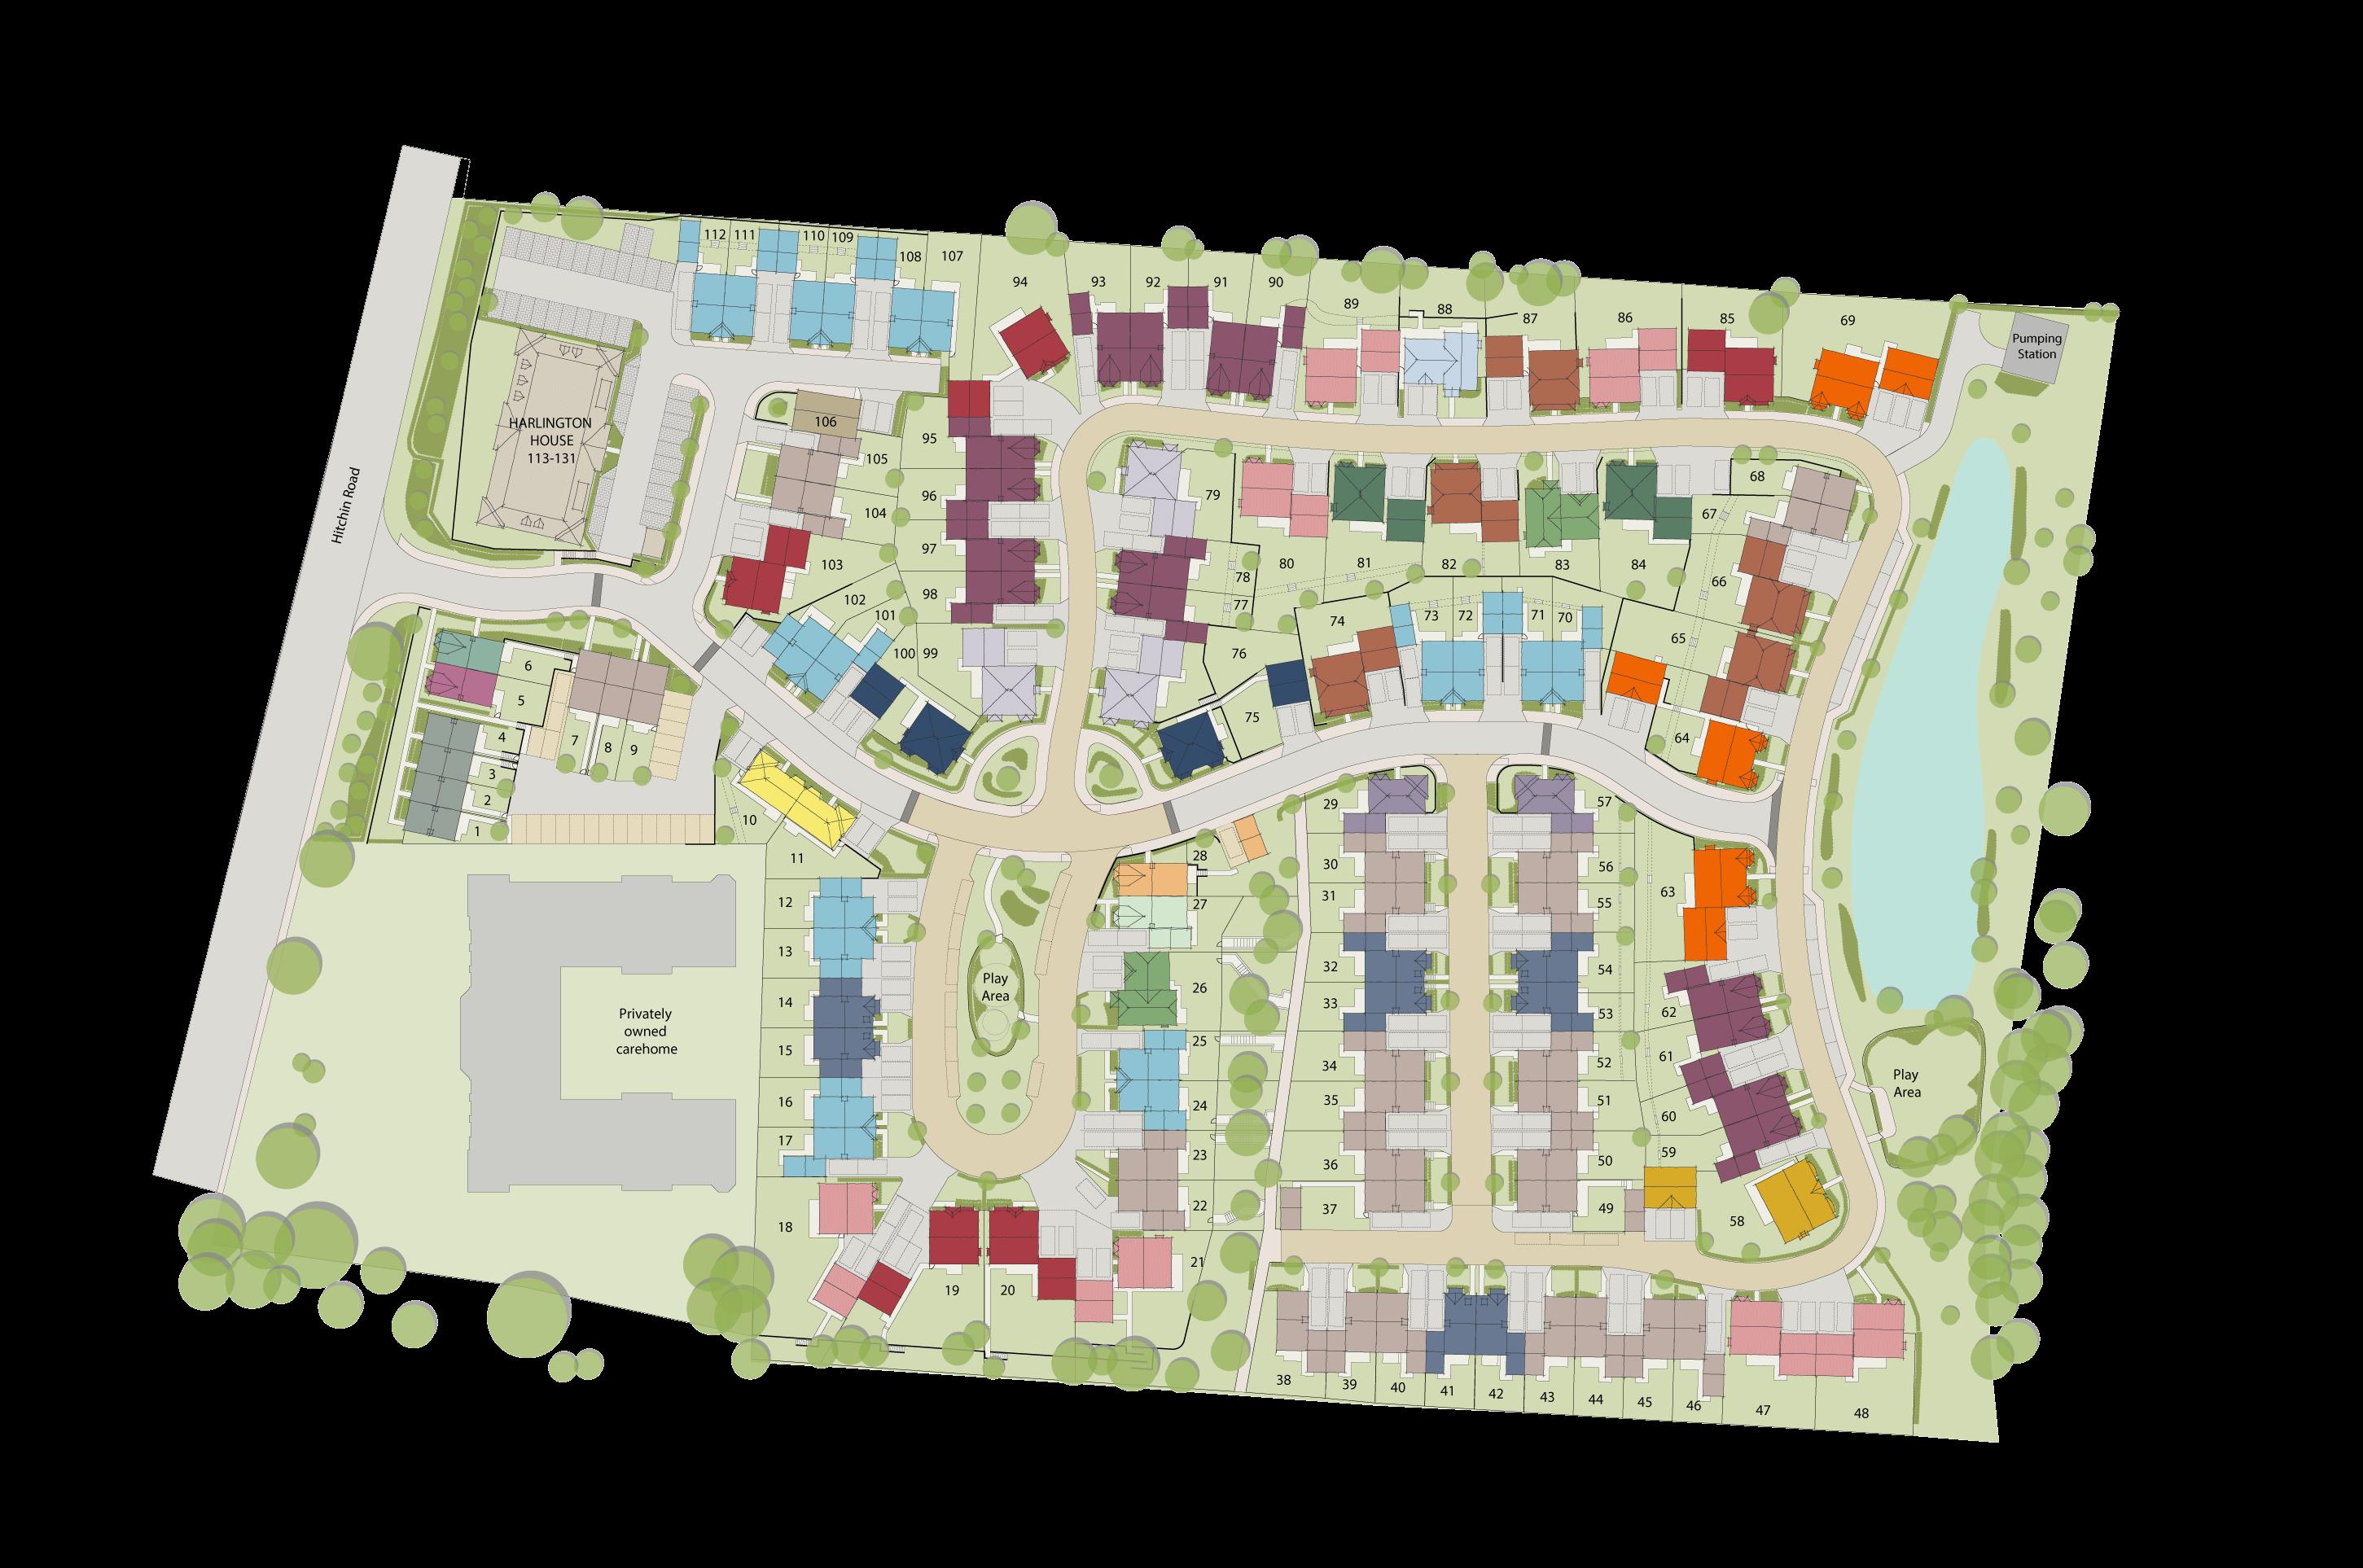 Fairfield Gardens plan